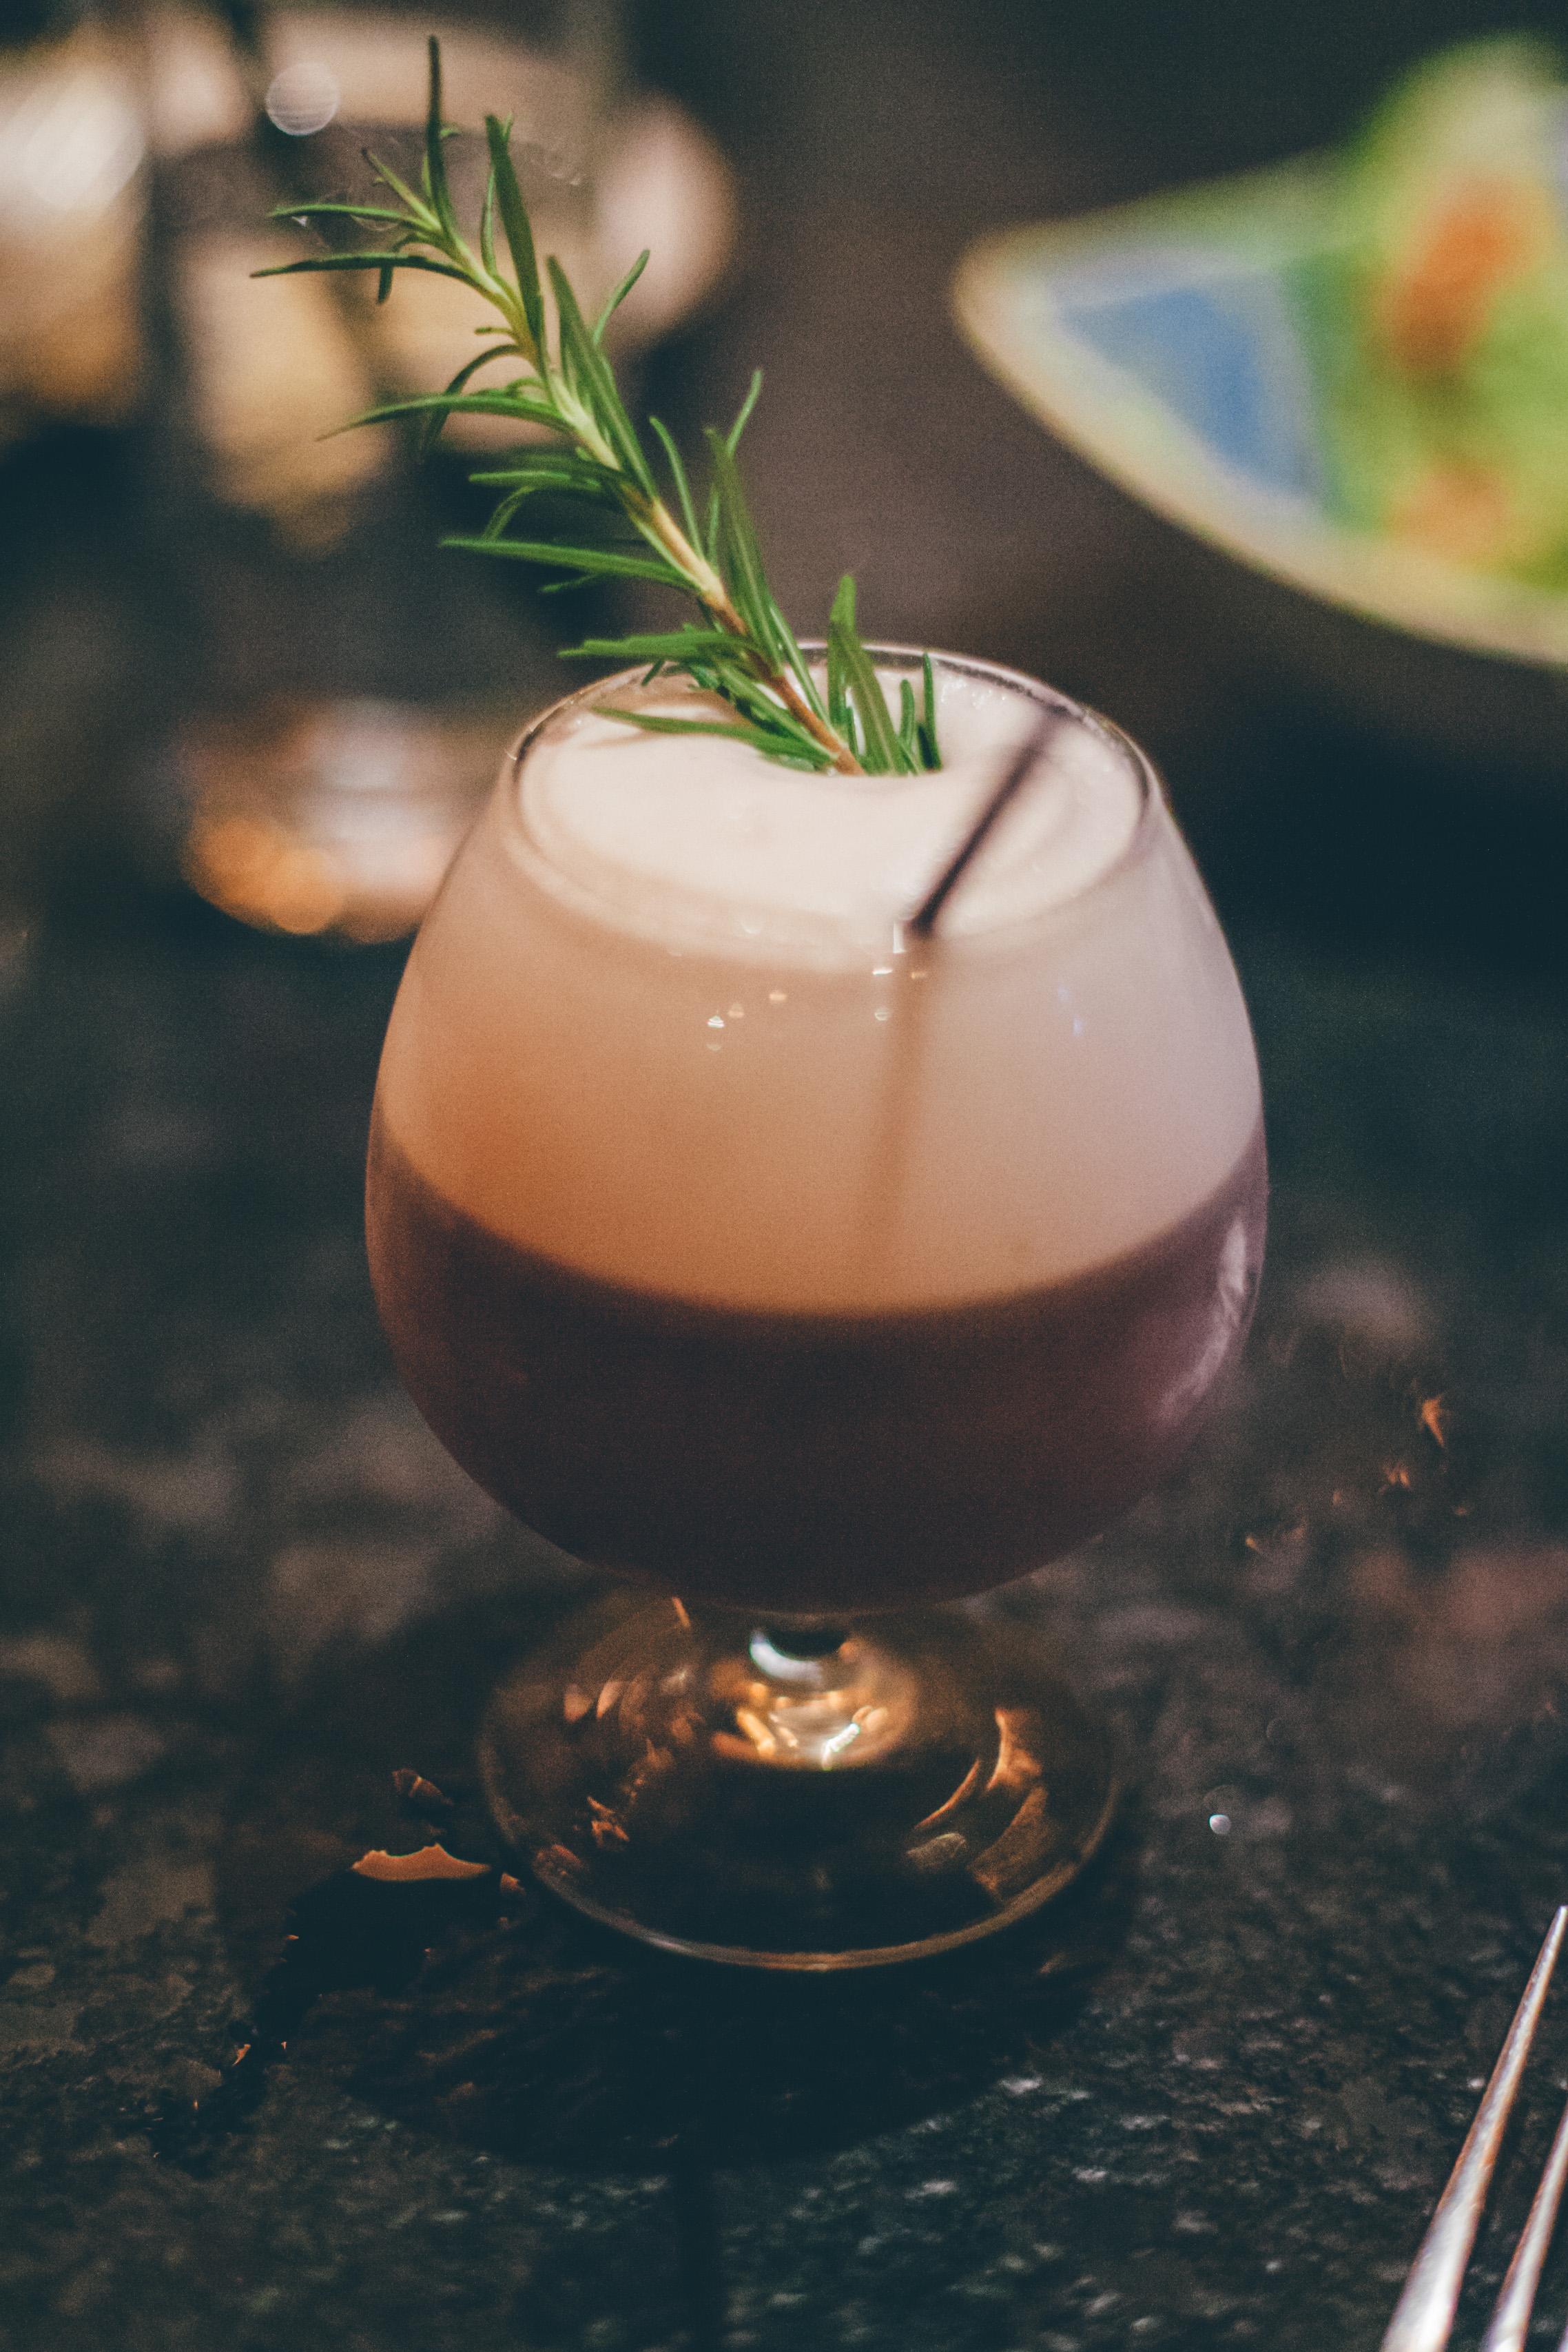 The Abigail:Plymouth Gin, Rothman & Winters Crème de Violette, lemon, blueberries, rosemary, egg white